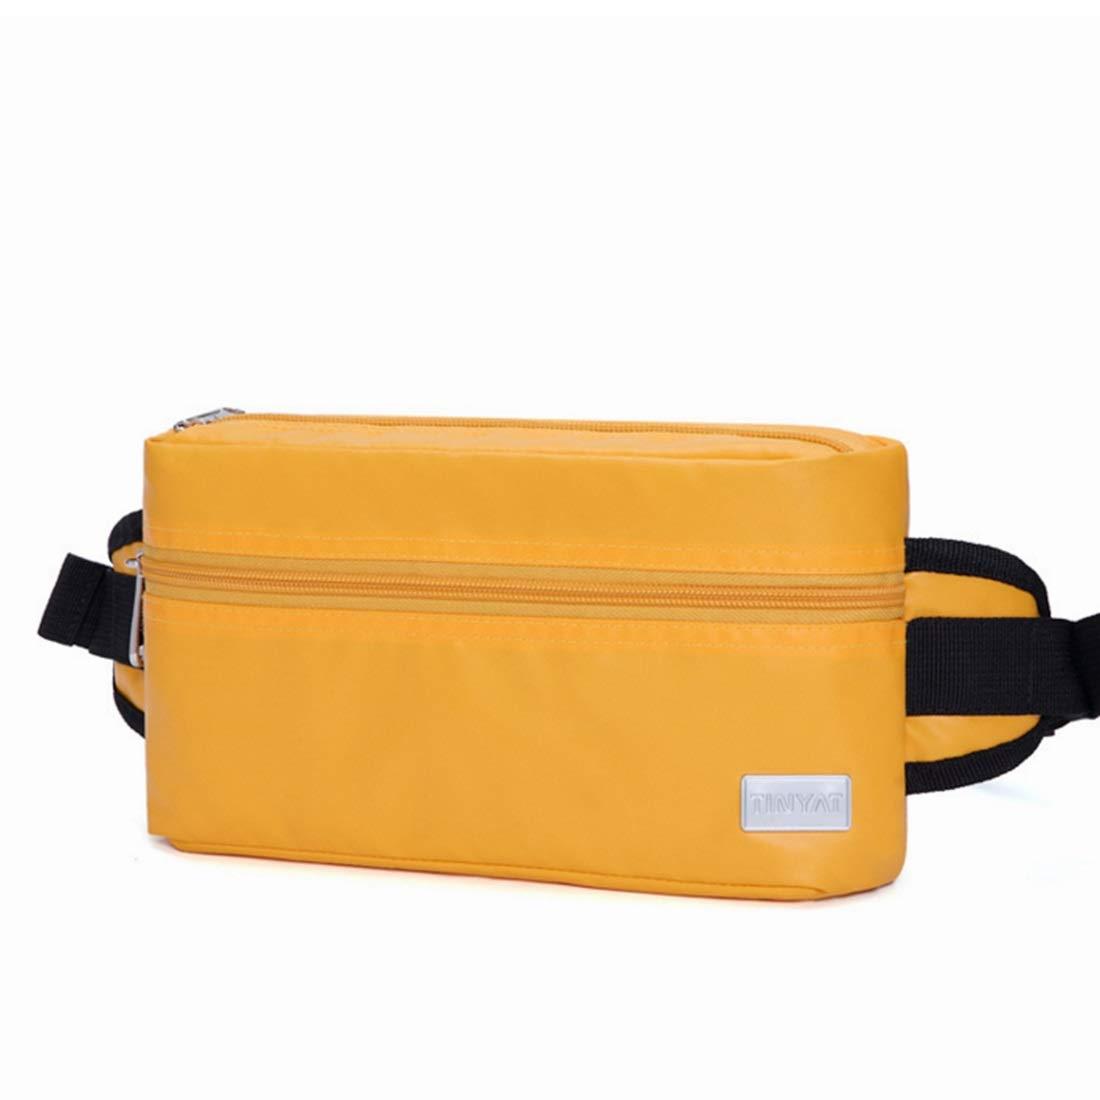 RABILTY Chest Bag Travel Hiking Outdoor Sport Waist Bag Money Hip Pouch Bag Color : Blue